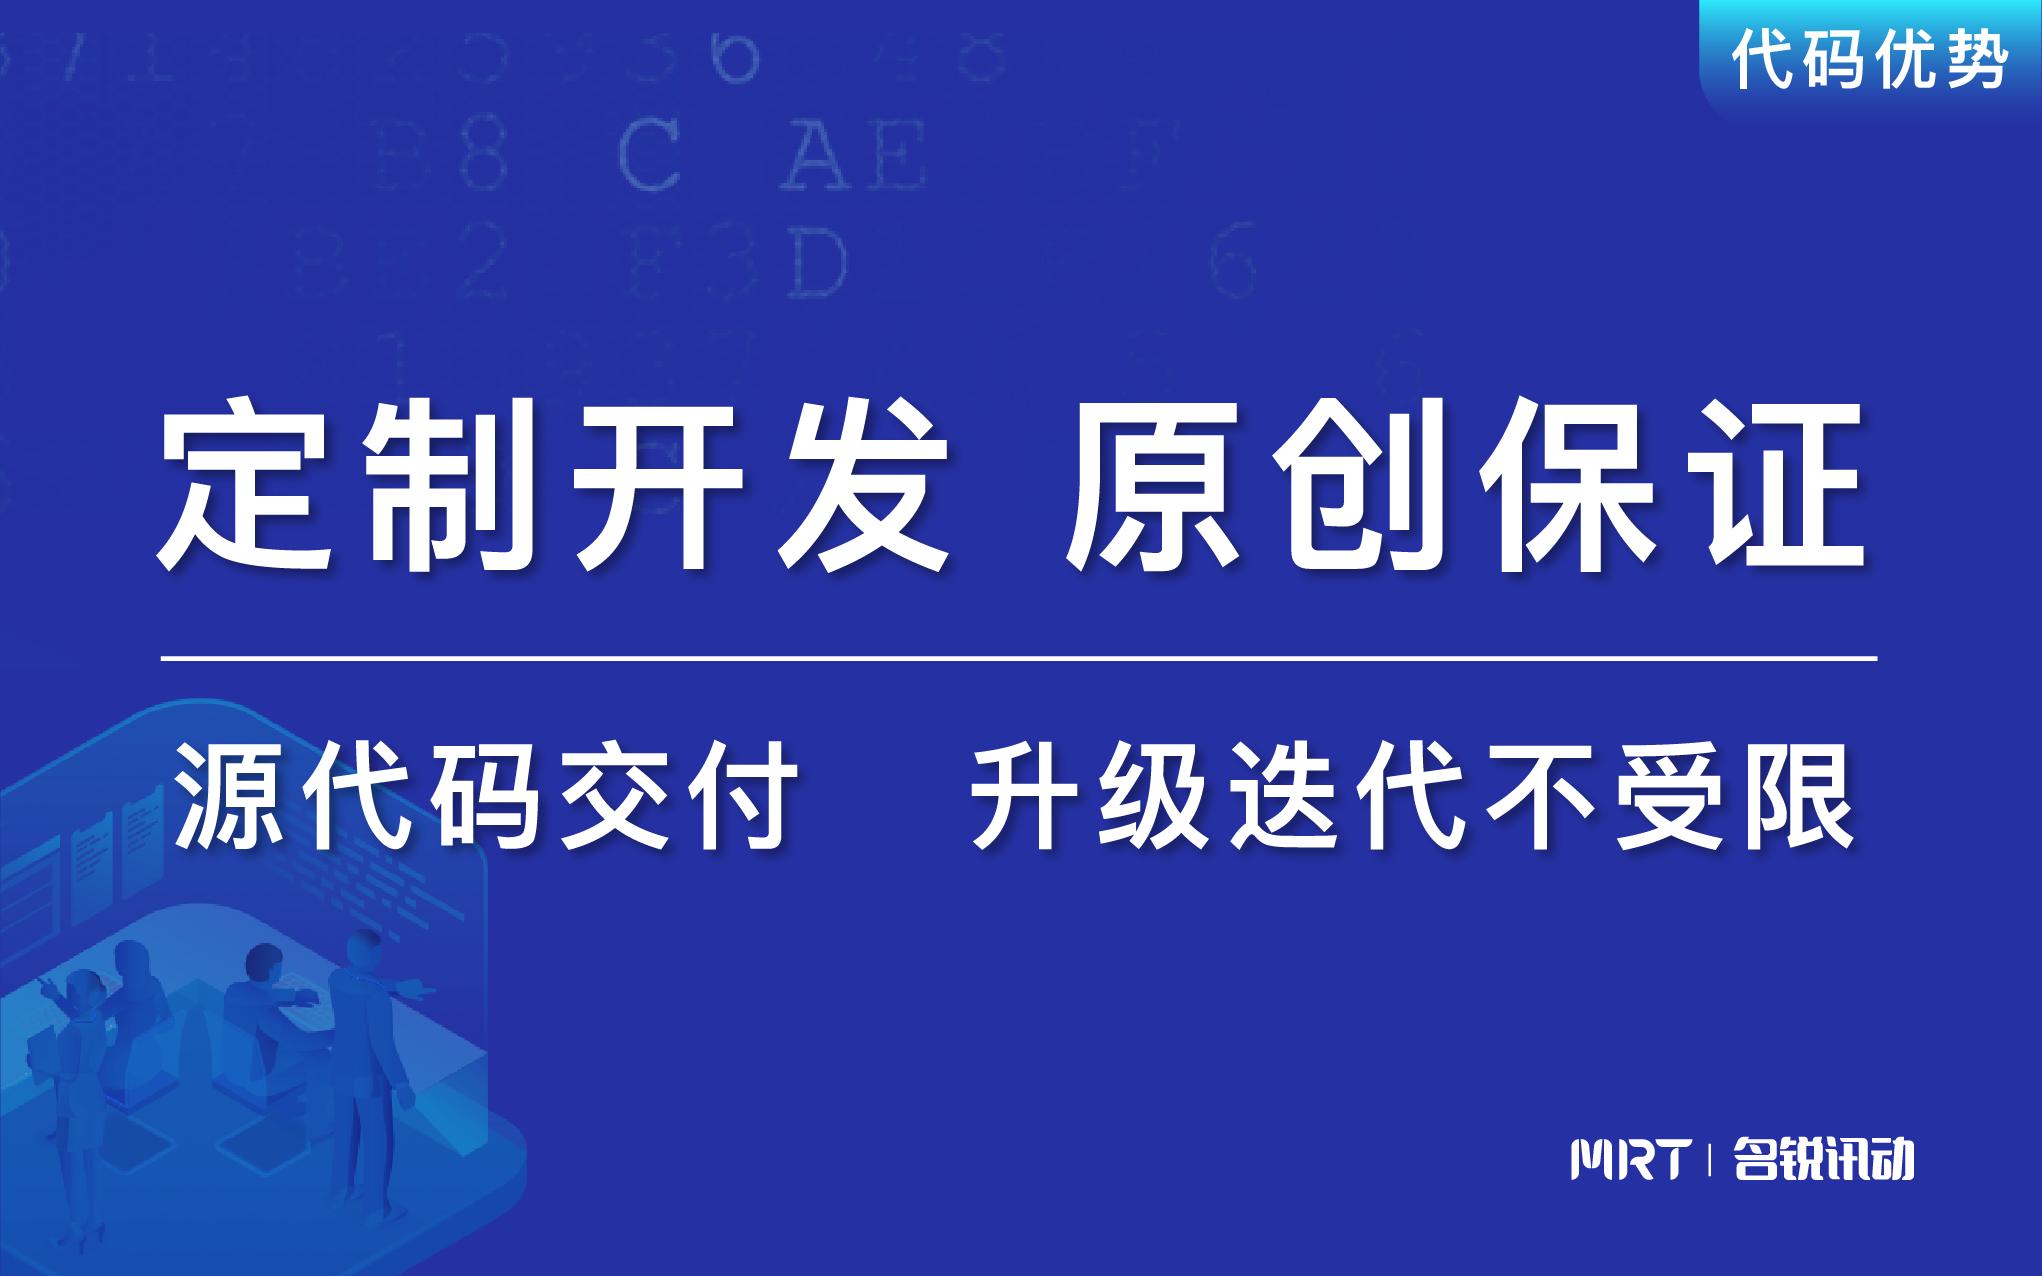 H5开发 活动邀请函报名预约H5调查问卷线上展会推广网站设计